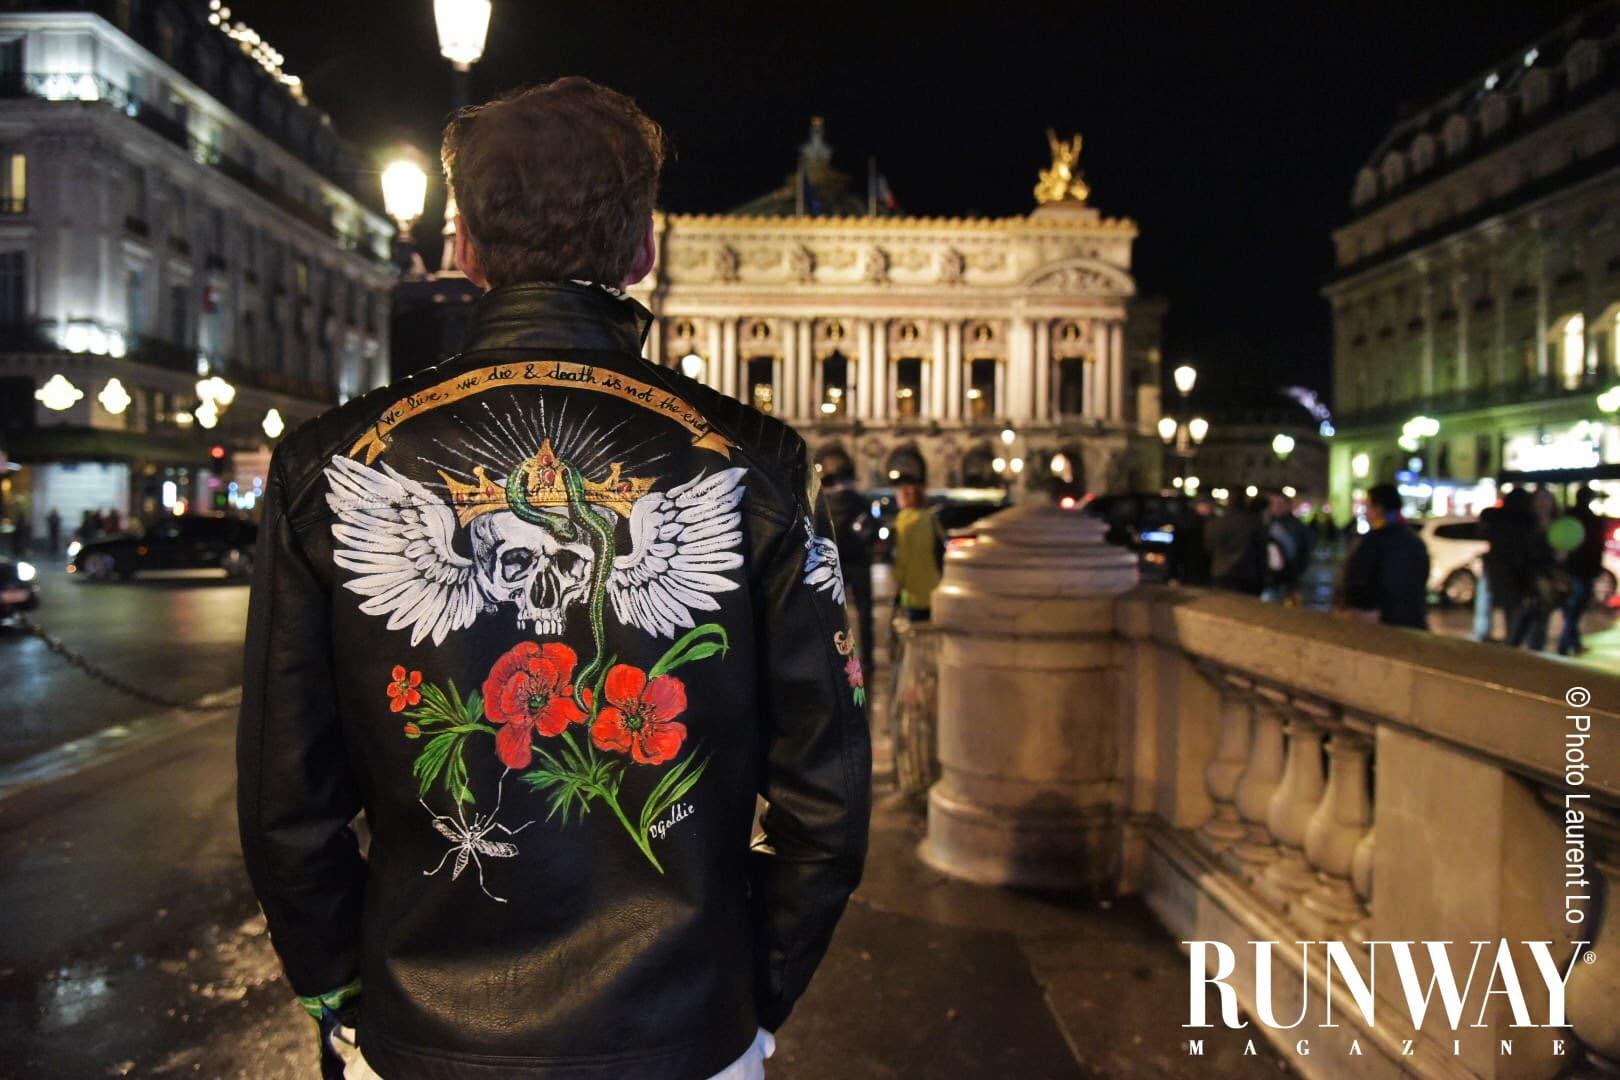 Runway-Magazine-2017-photo-Laurent-Lo-paris-Patrick-Cordier-Rettig-model-fashion-week-opera